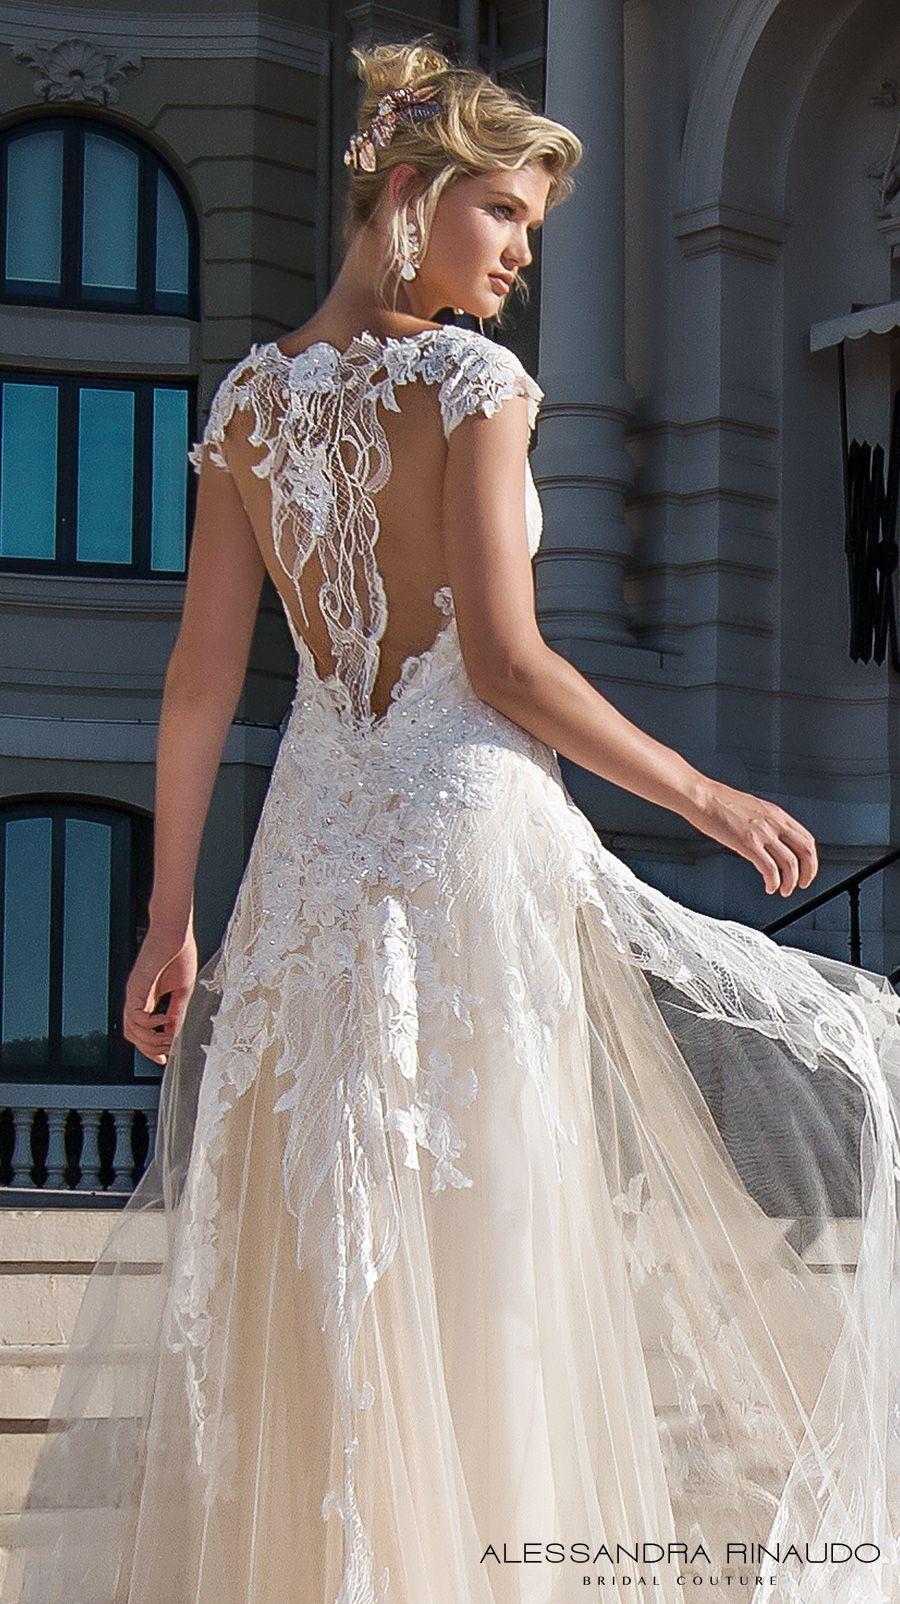 4af7b3cd316 alessandra rinaudo 2017 bridal cap sleeves scoop neckline heavily  embellished bodice ivory color romantic princess a line wedding dress razor  back chapel ...